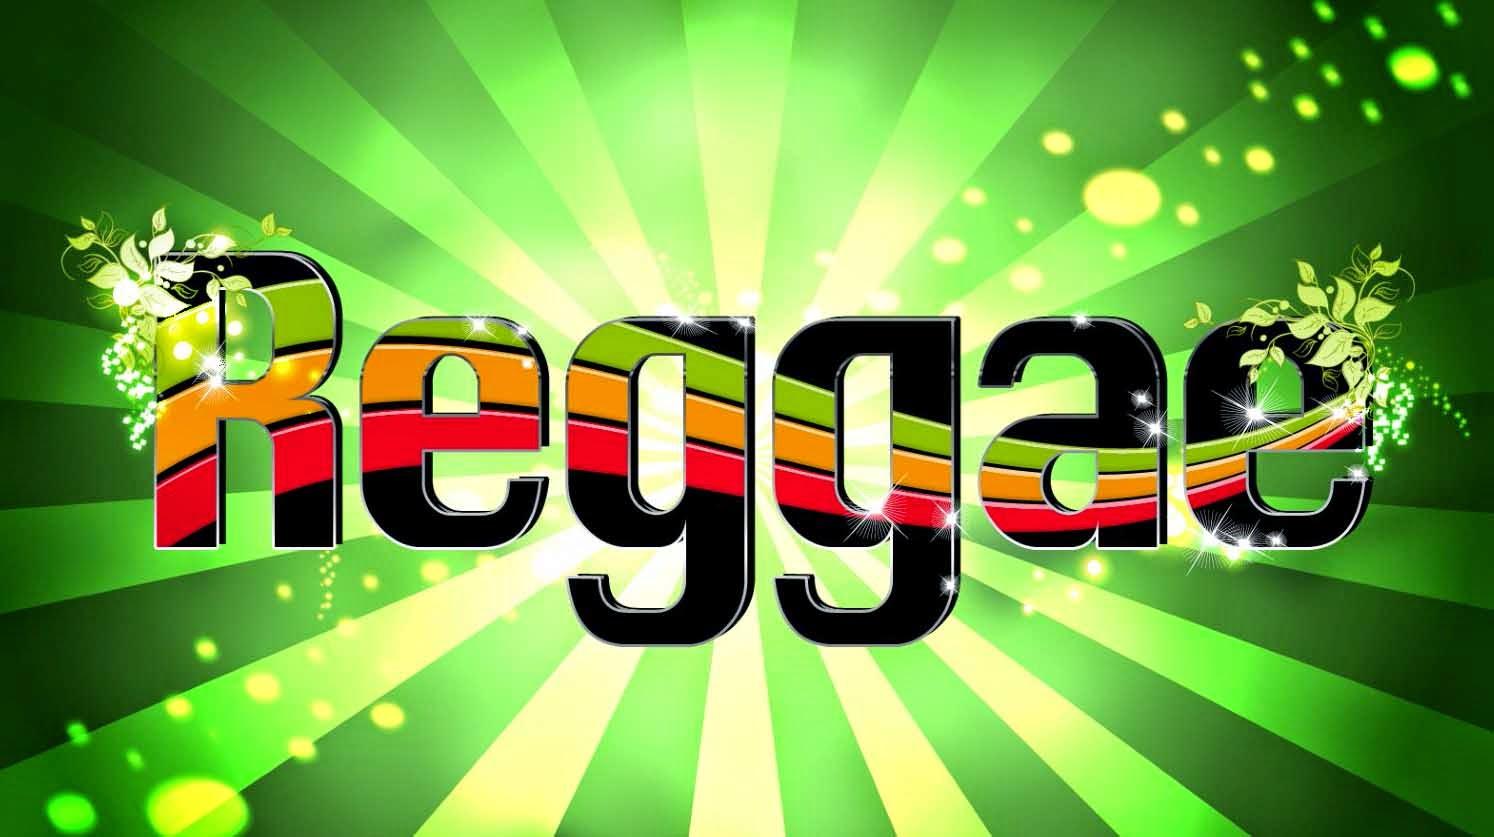 Unduh 45 Koleksi Wallpaper Animasi Reggae HD Gratid